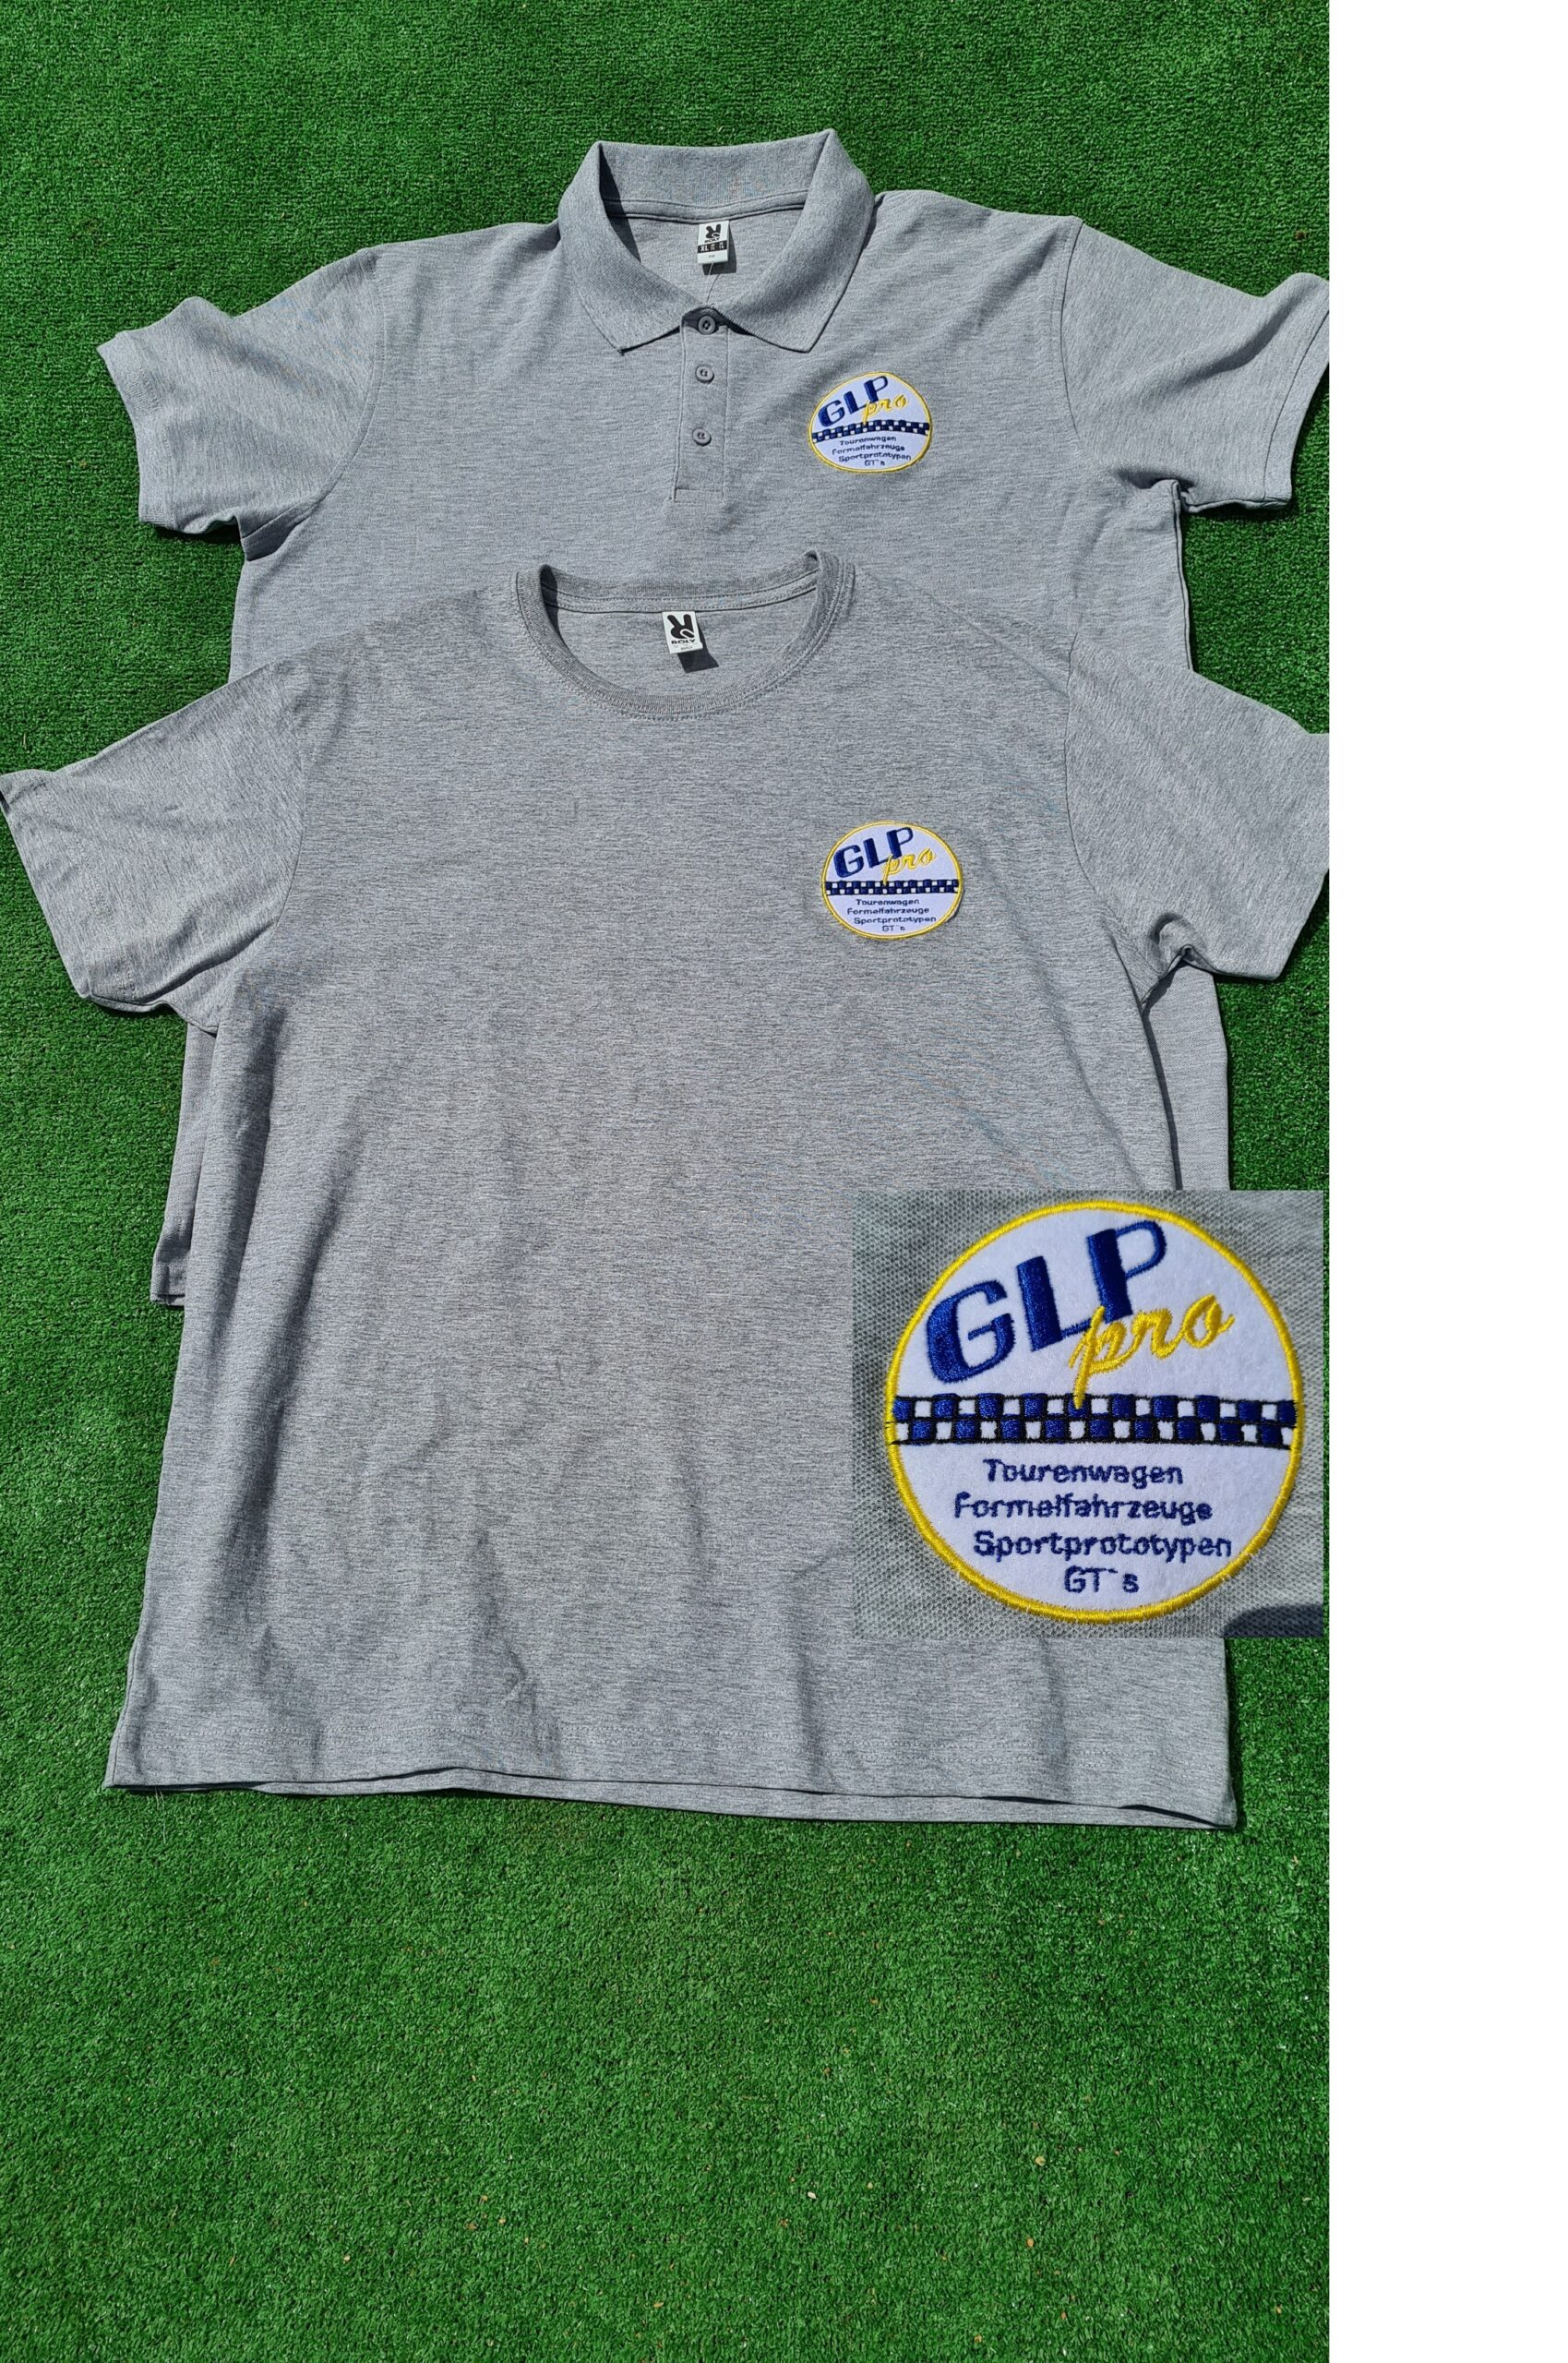 AUSVERKAUFT GLPpro T-Shirts und Polo-Hemden